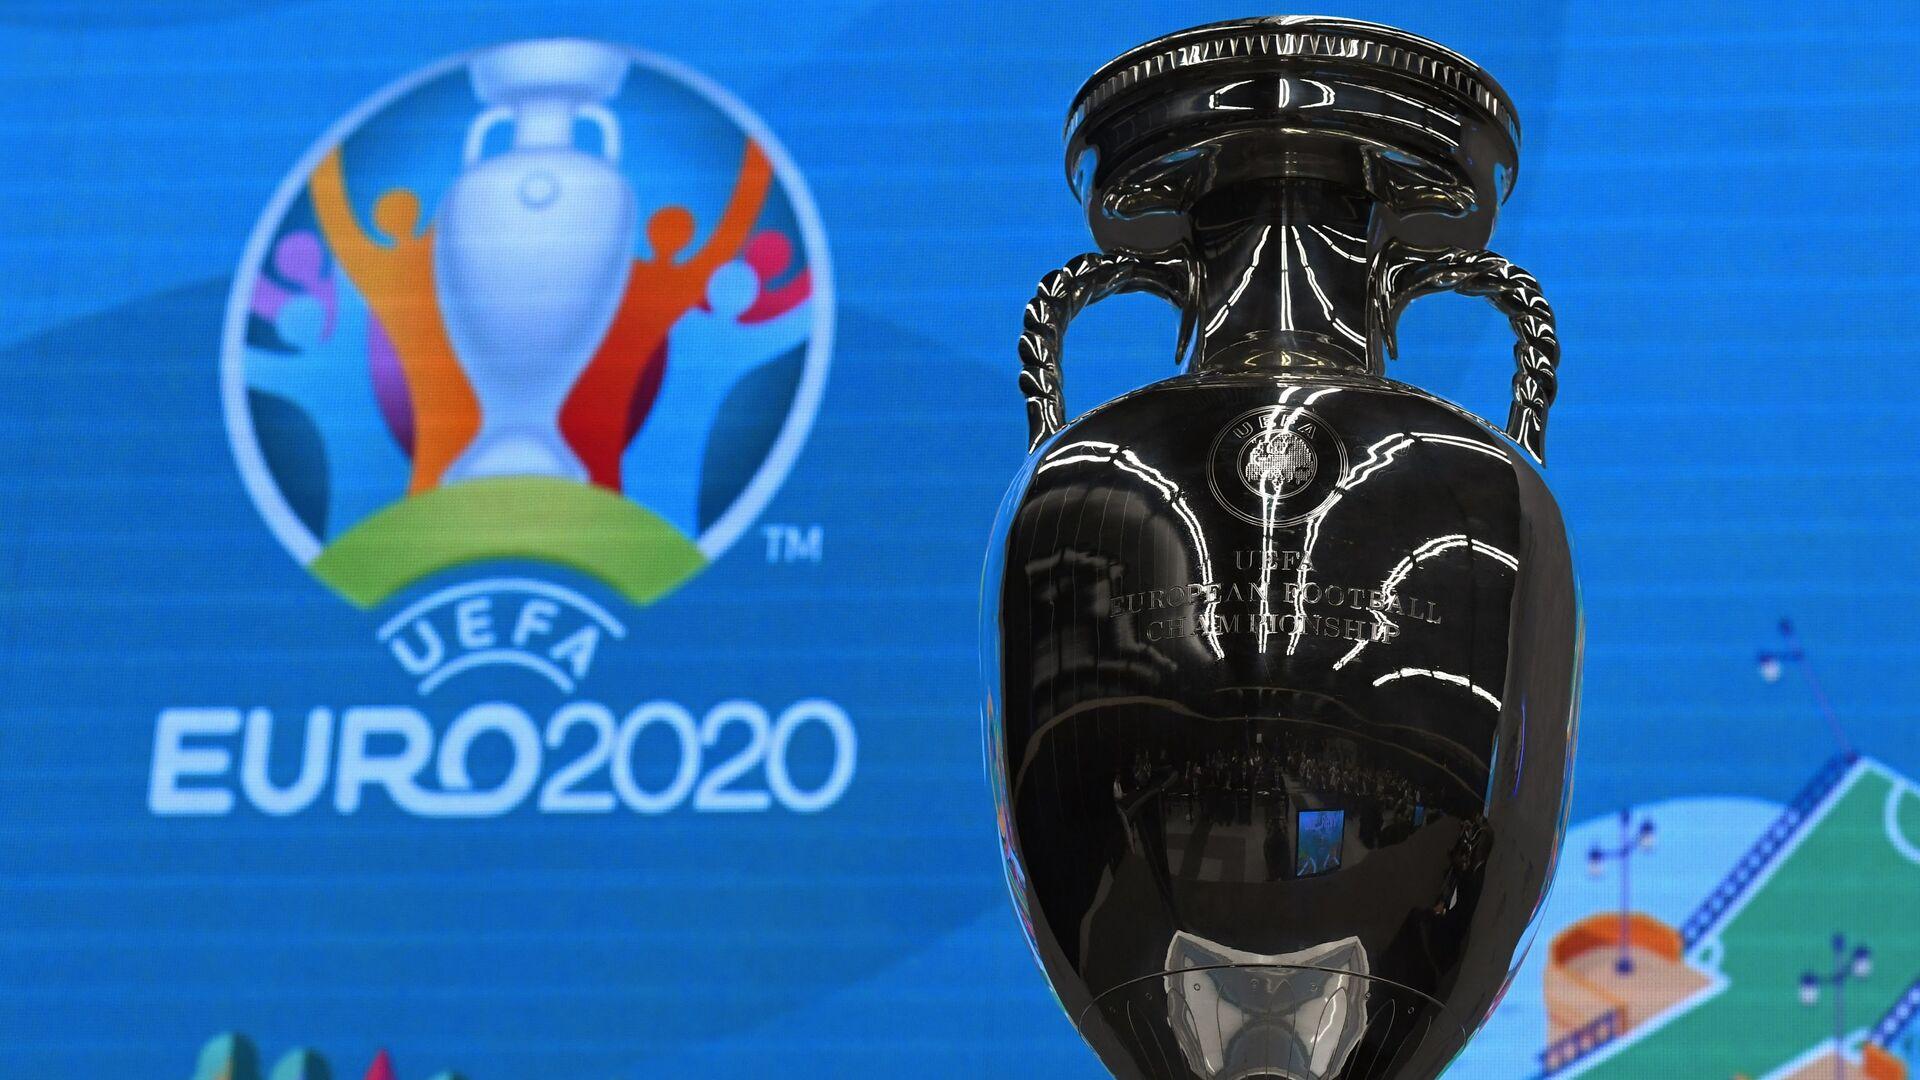 Evro-2020-ის თასი - Sputnik საქართველო, 1920, 30.09.2021